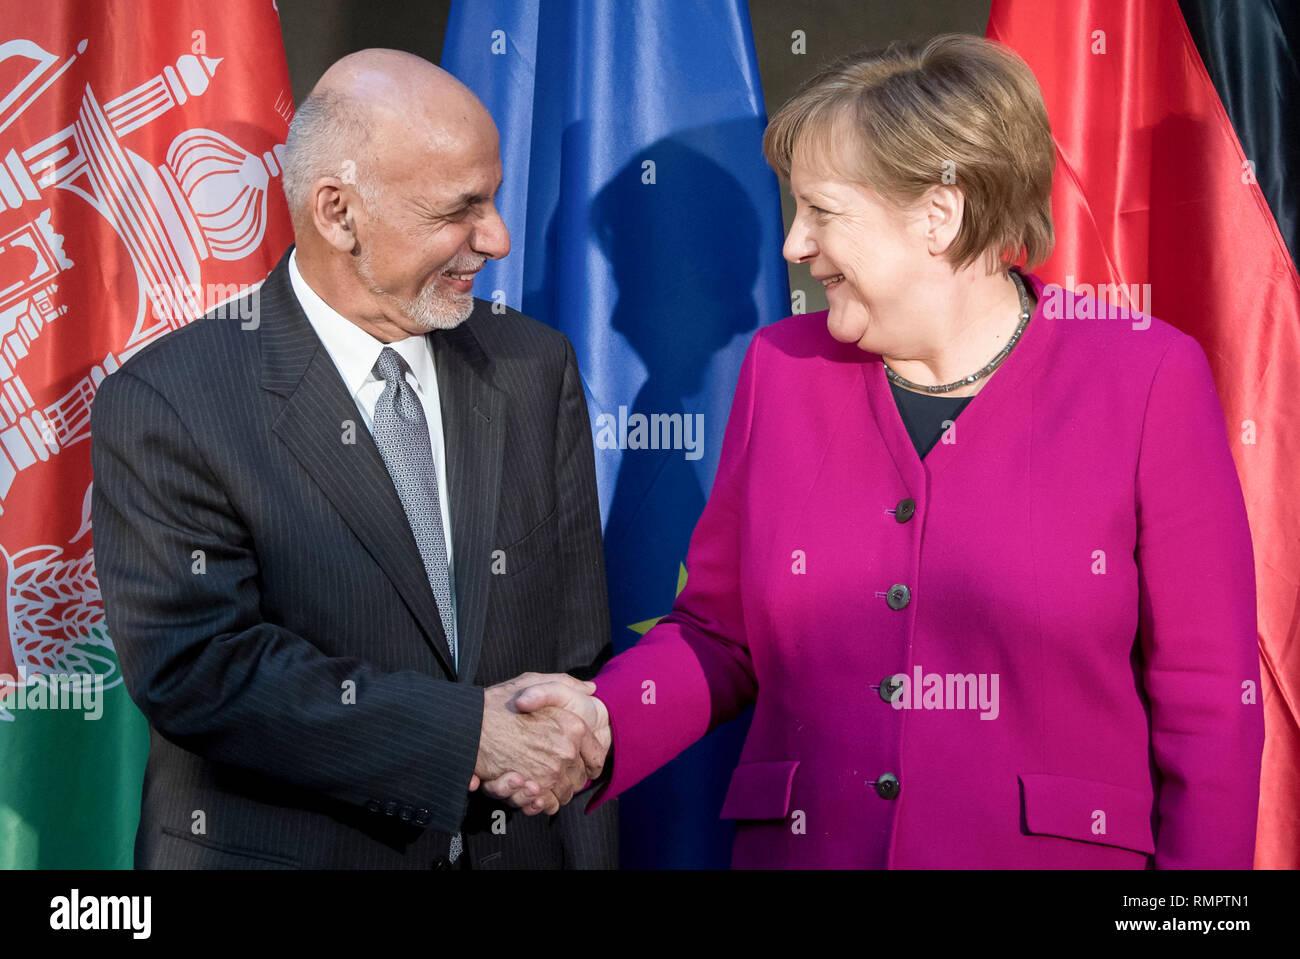 Munich, Germany  16th Feb, 2019  Chancellor Angela Merkel